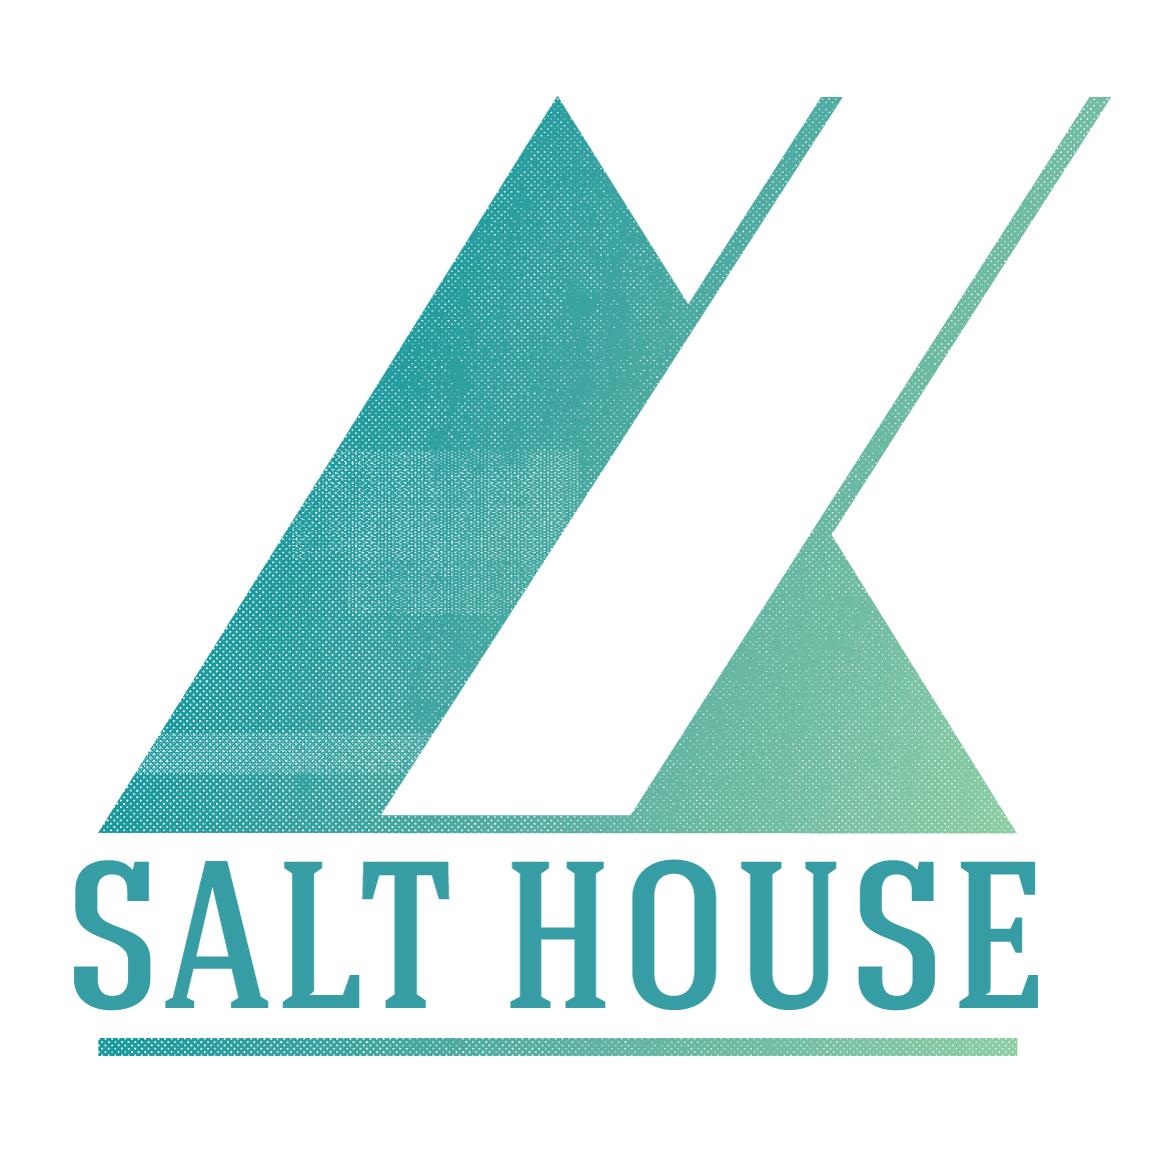 Salt House Image.jpg